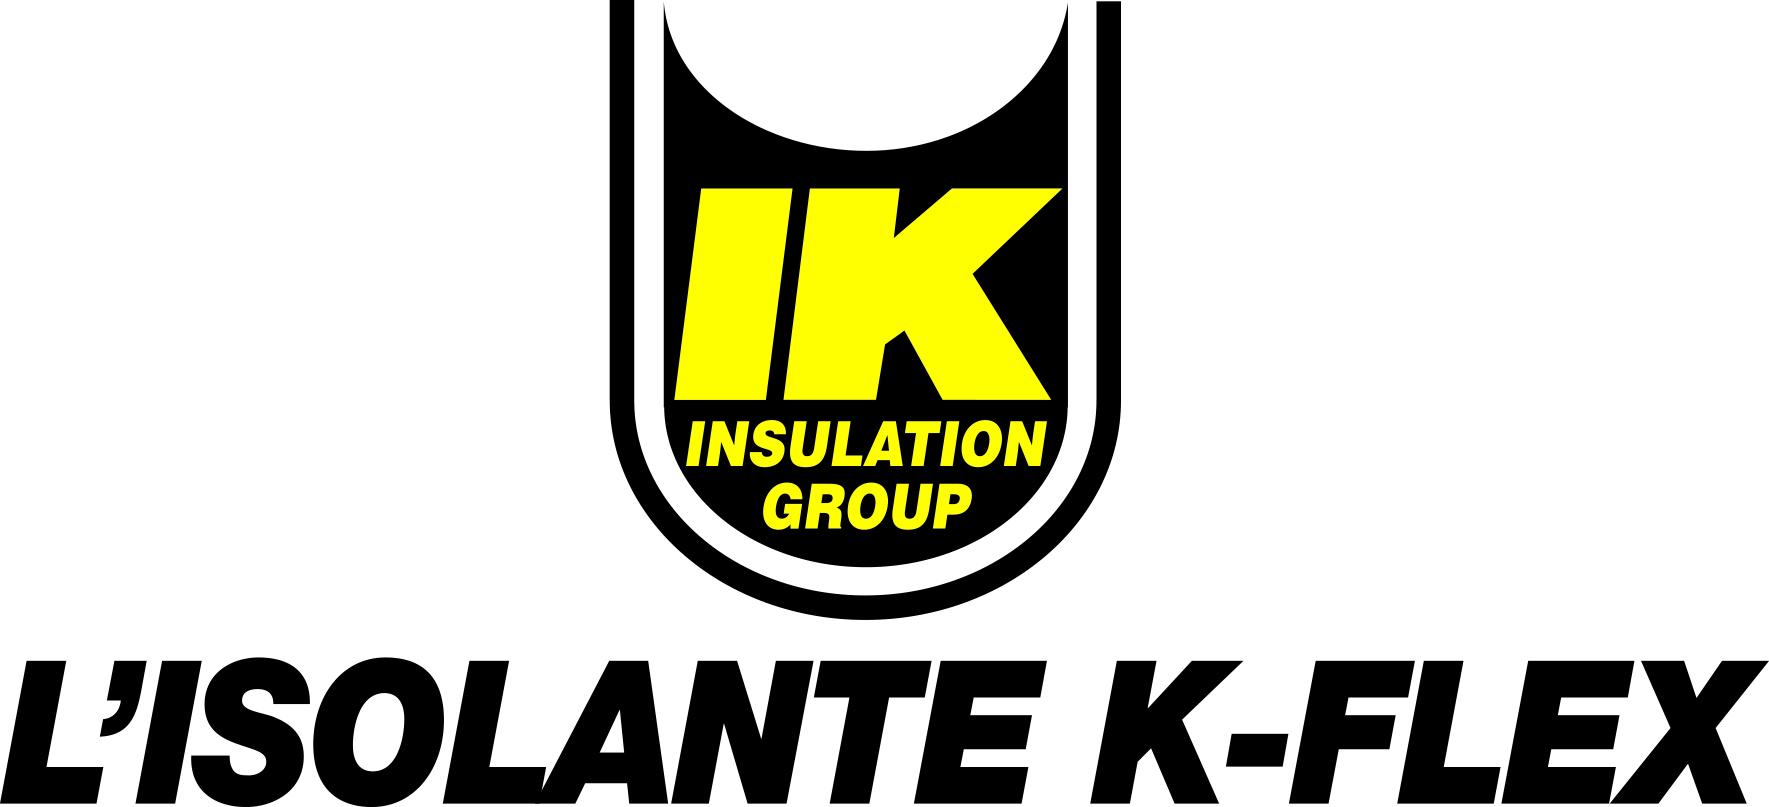 L Isolante K-Flex